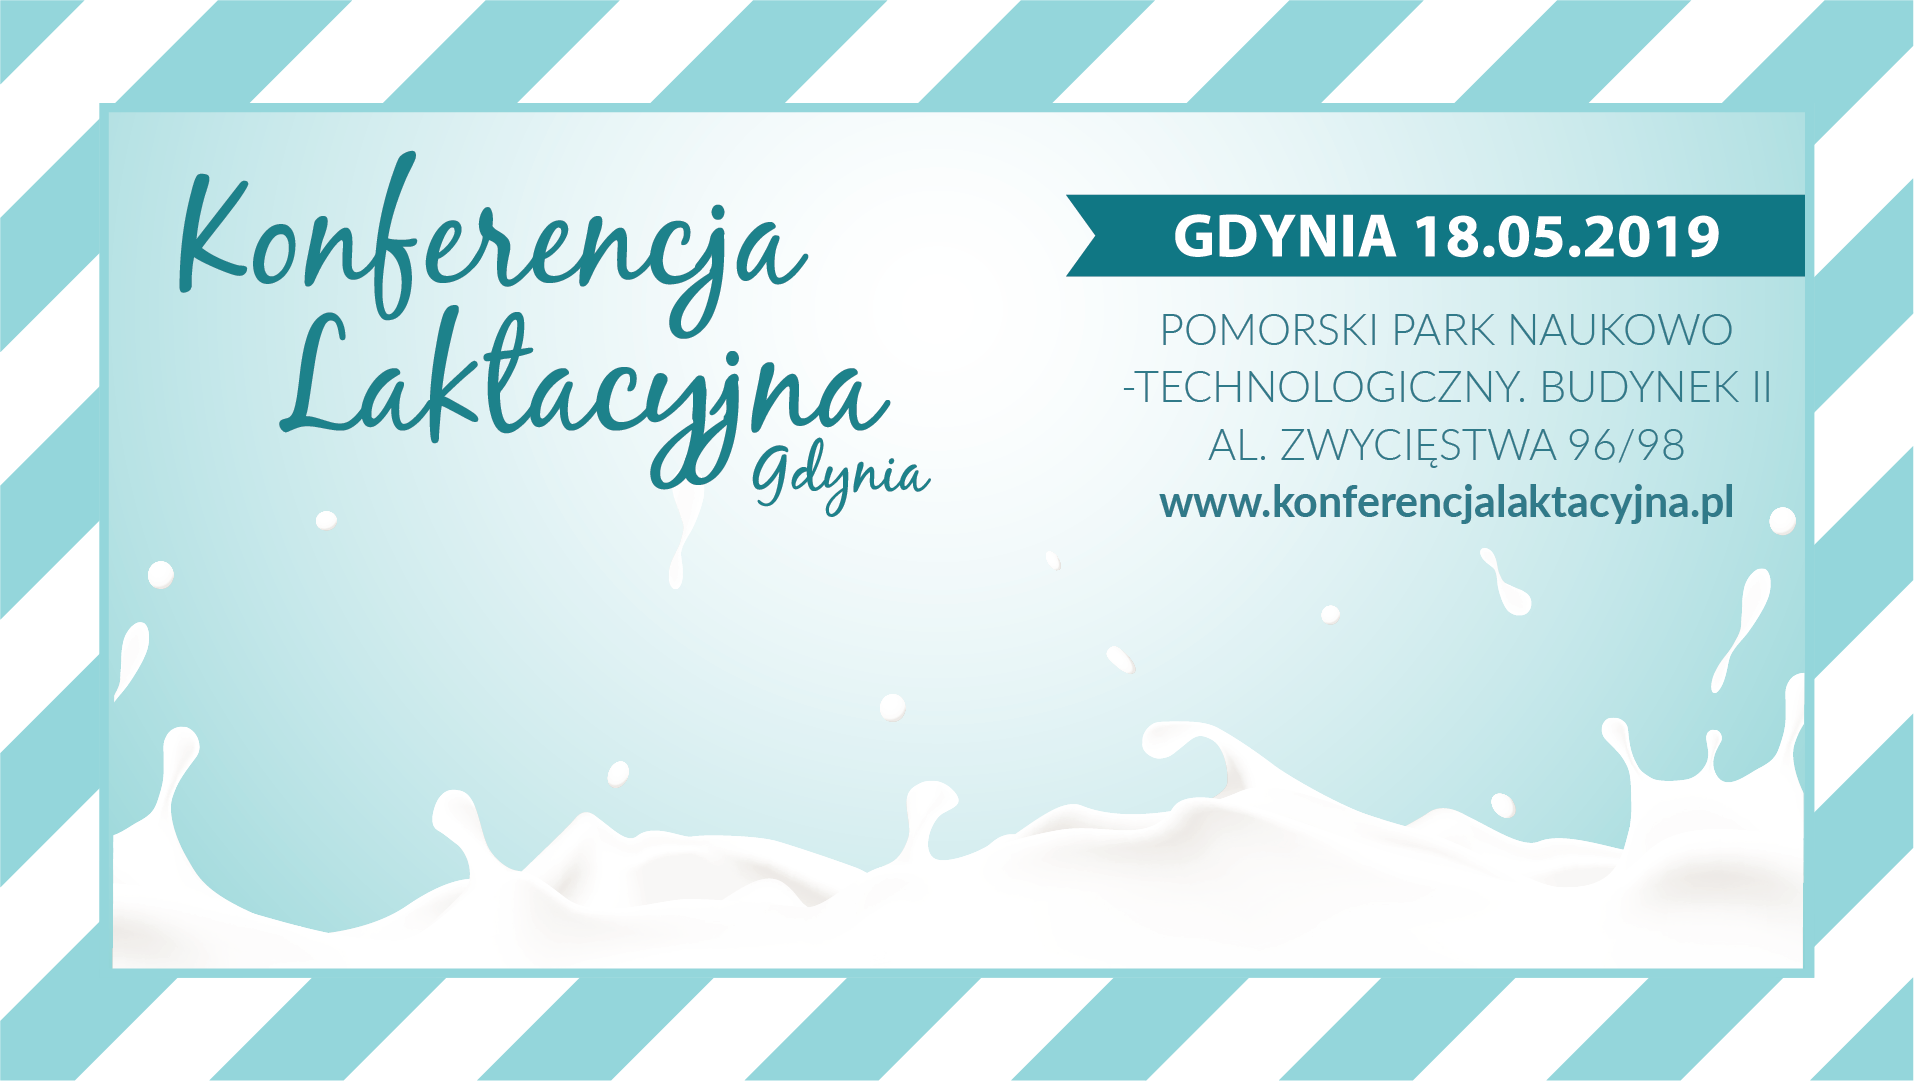 konferencja-laktacyjna-hipoalergiczni-patronat-poster